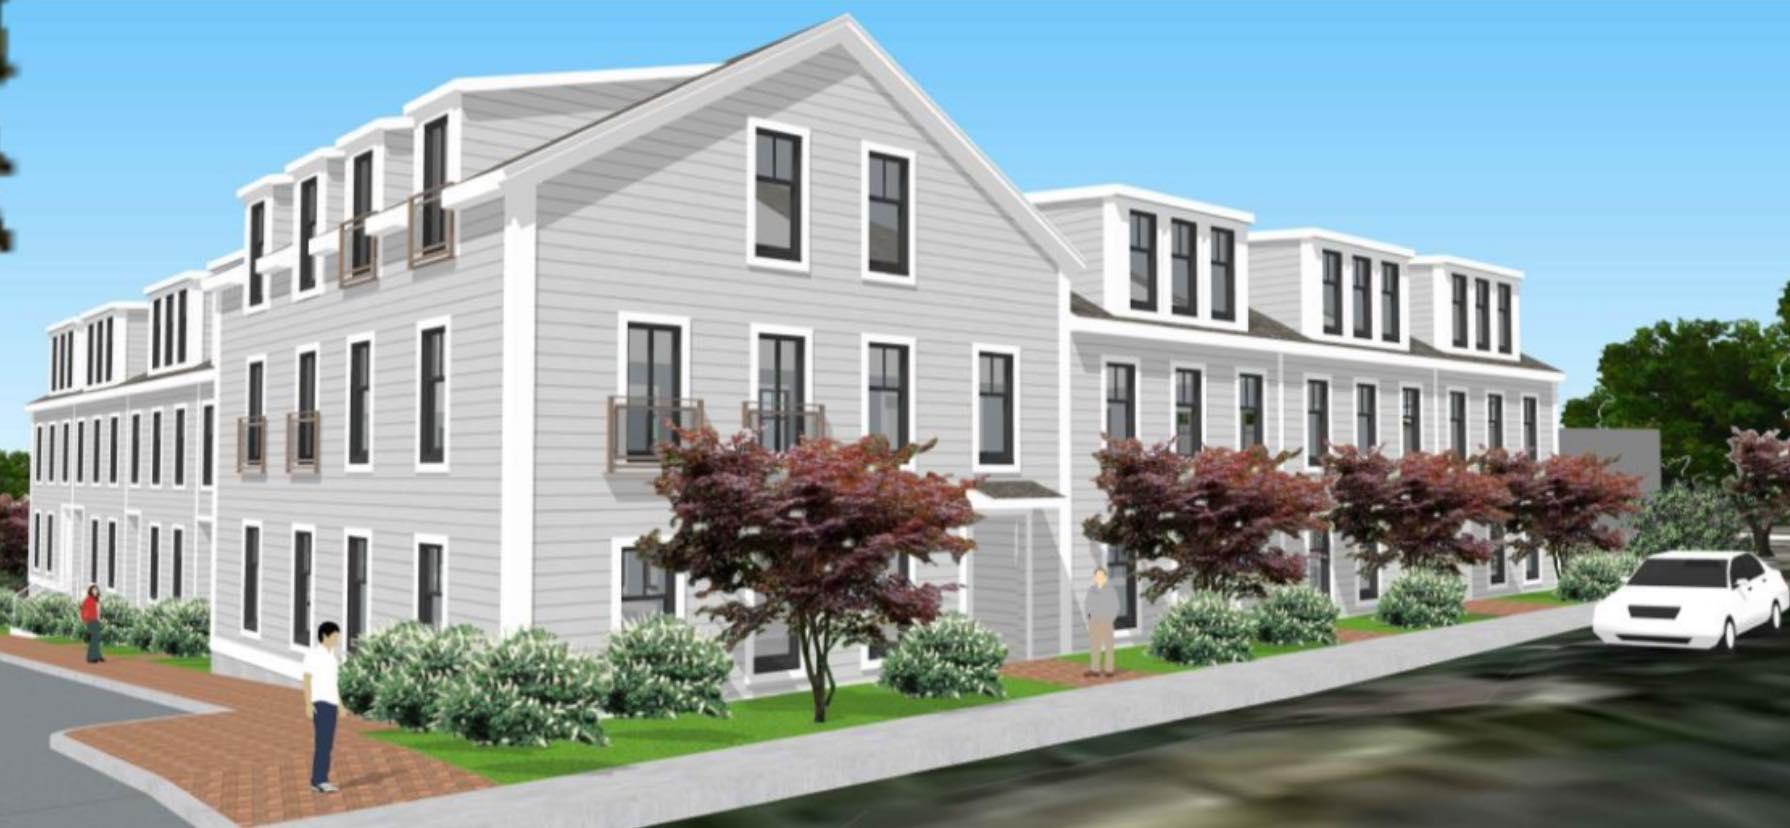 270 baker street residential development west roxbury boston